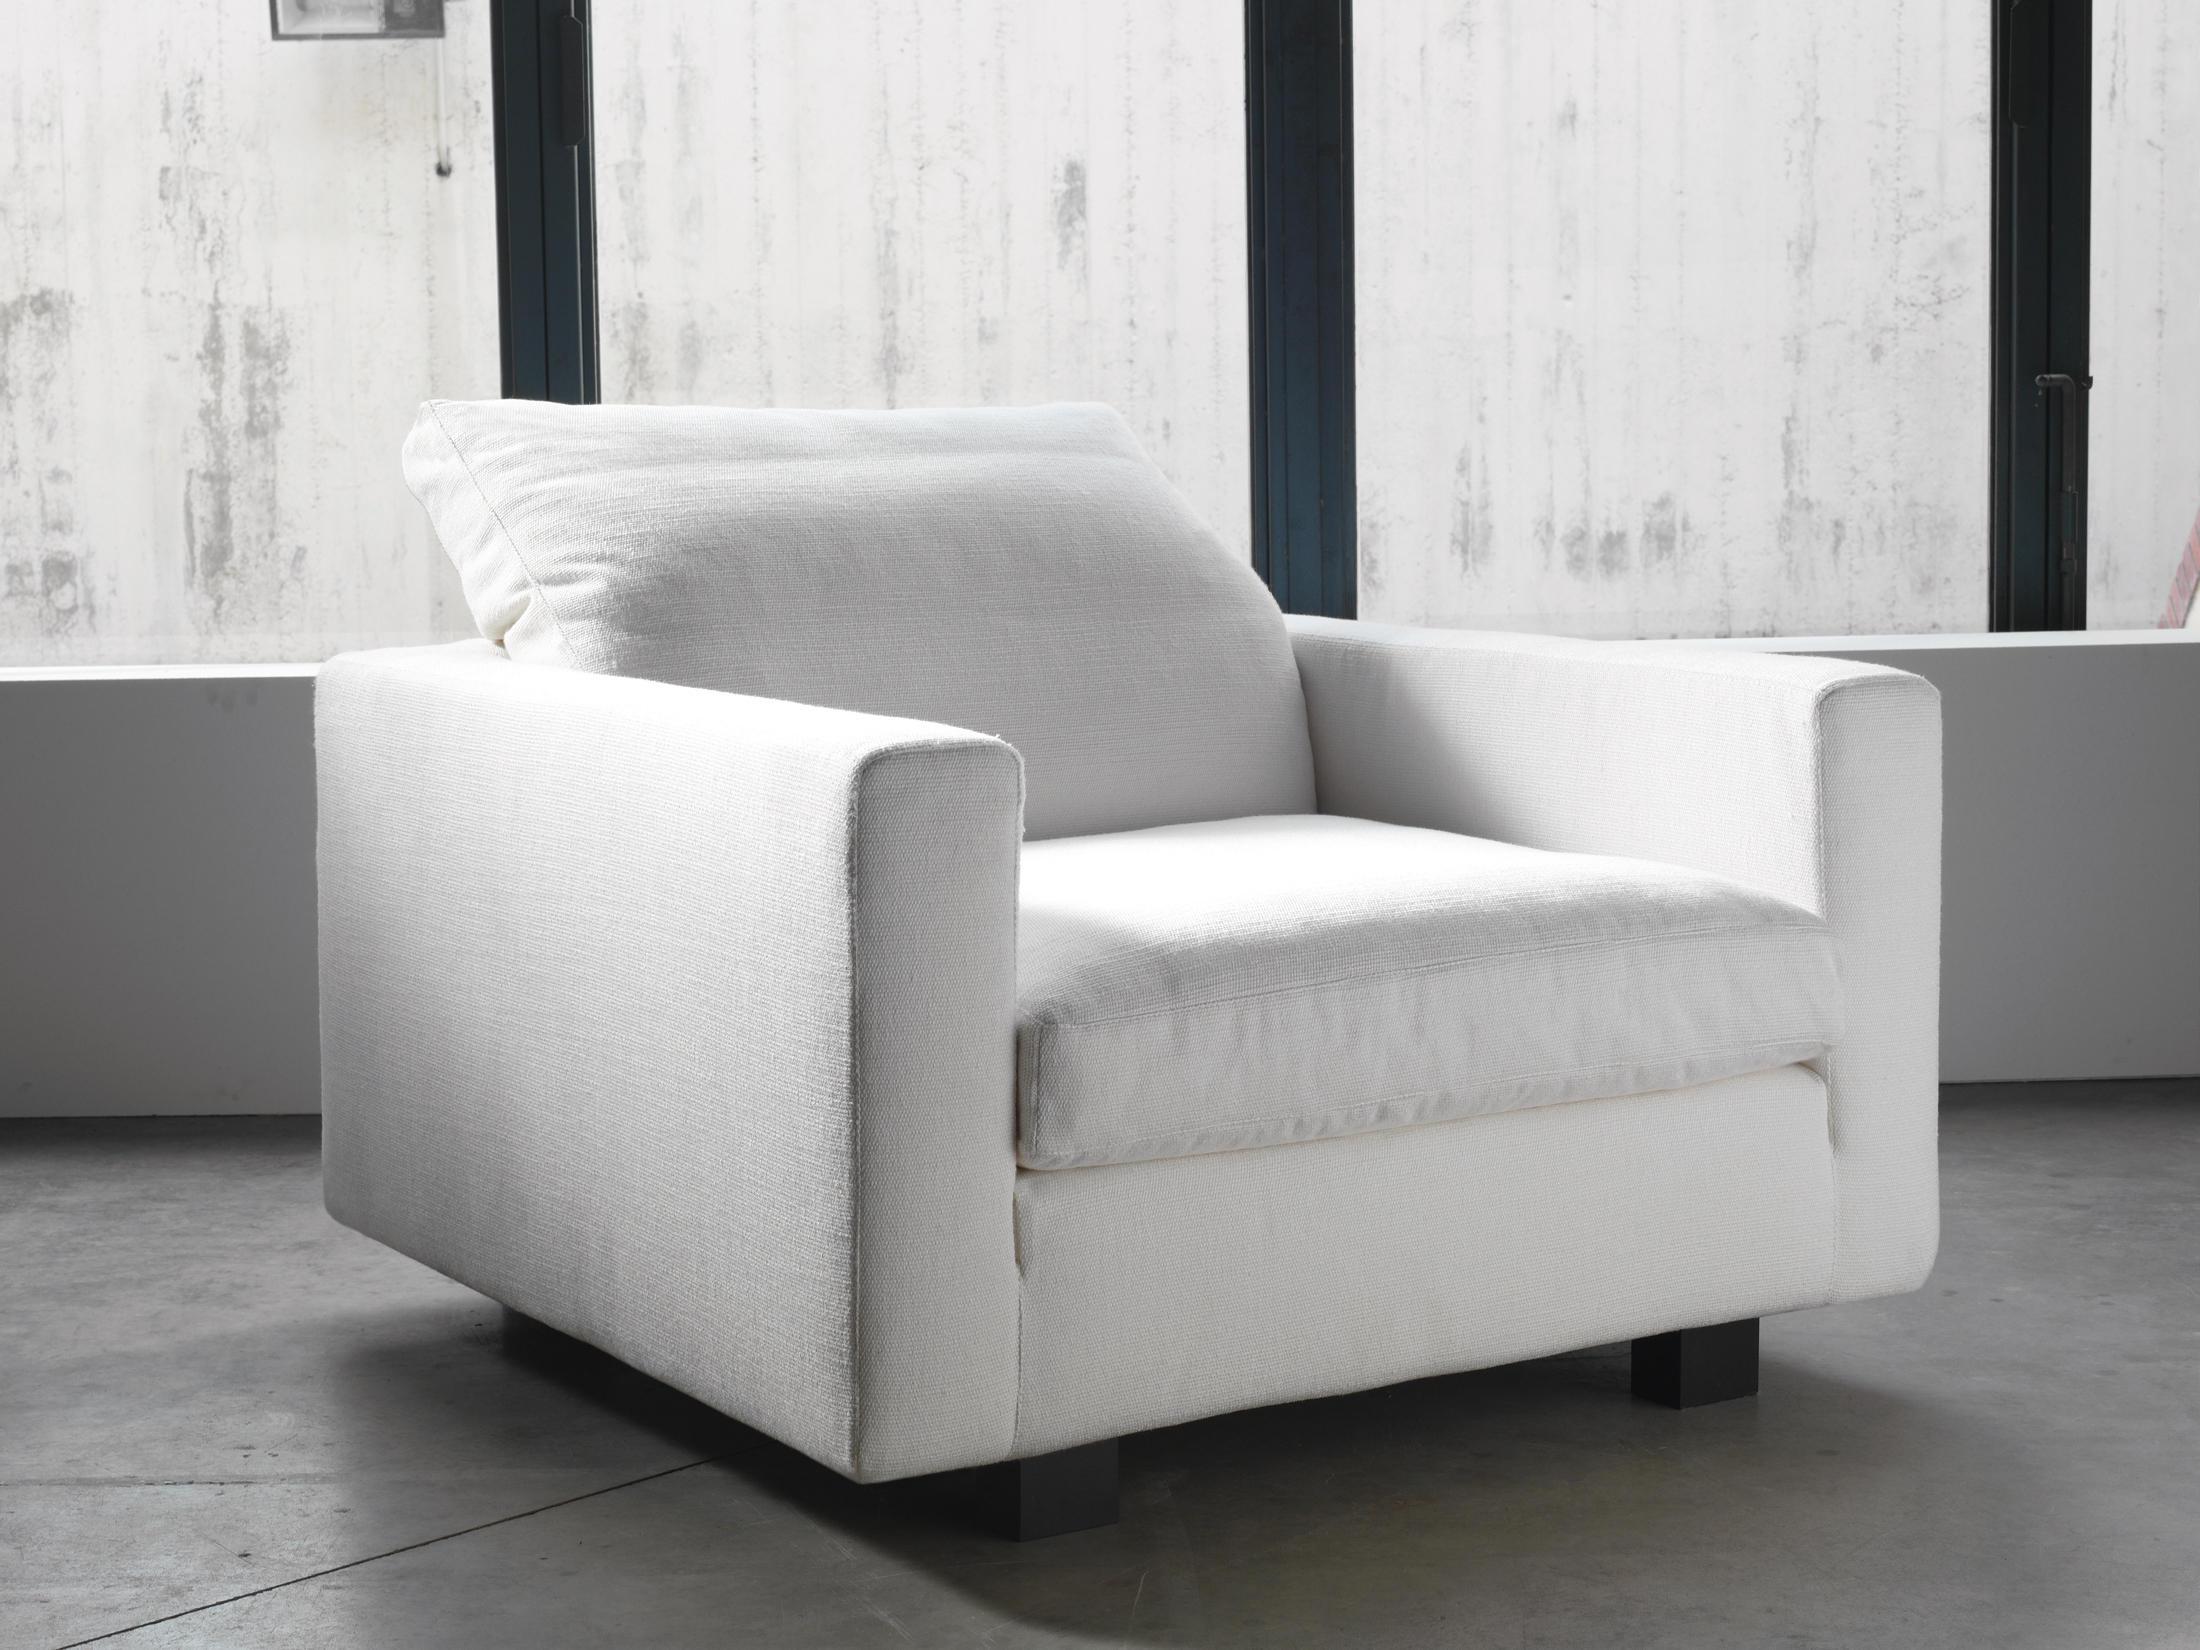 Shoko sof s lounge de rafemar architonic - Rafemar sofas ...